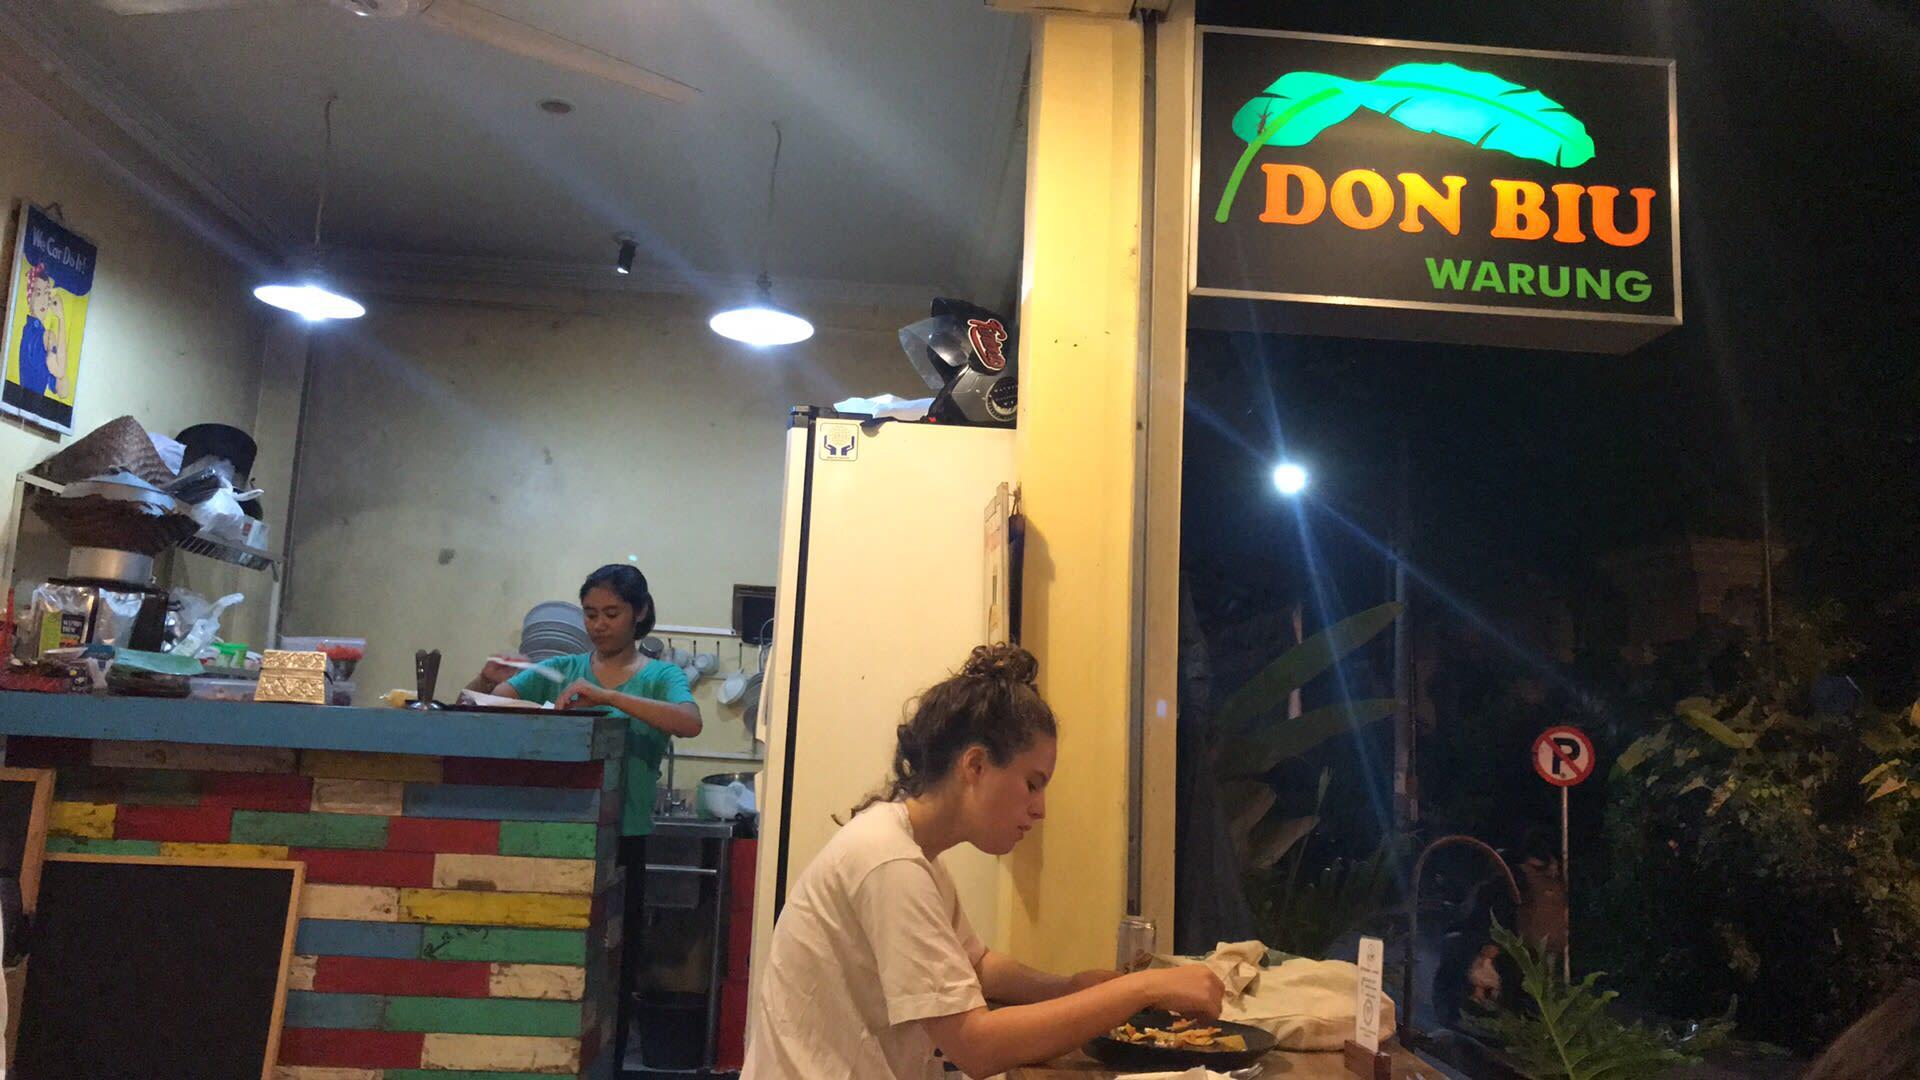 quán ăn donbiu warung